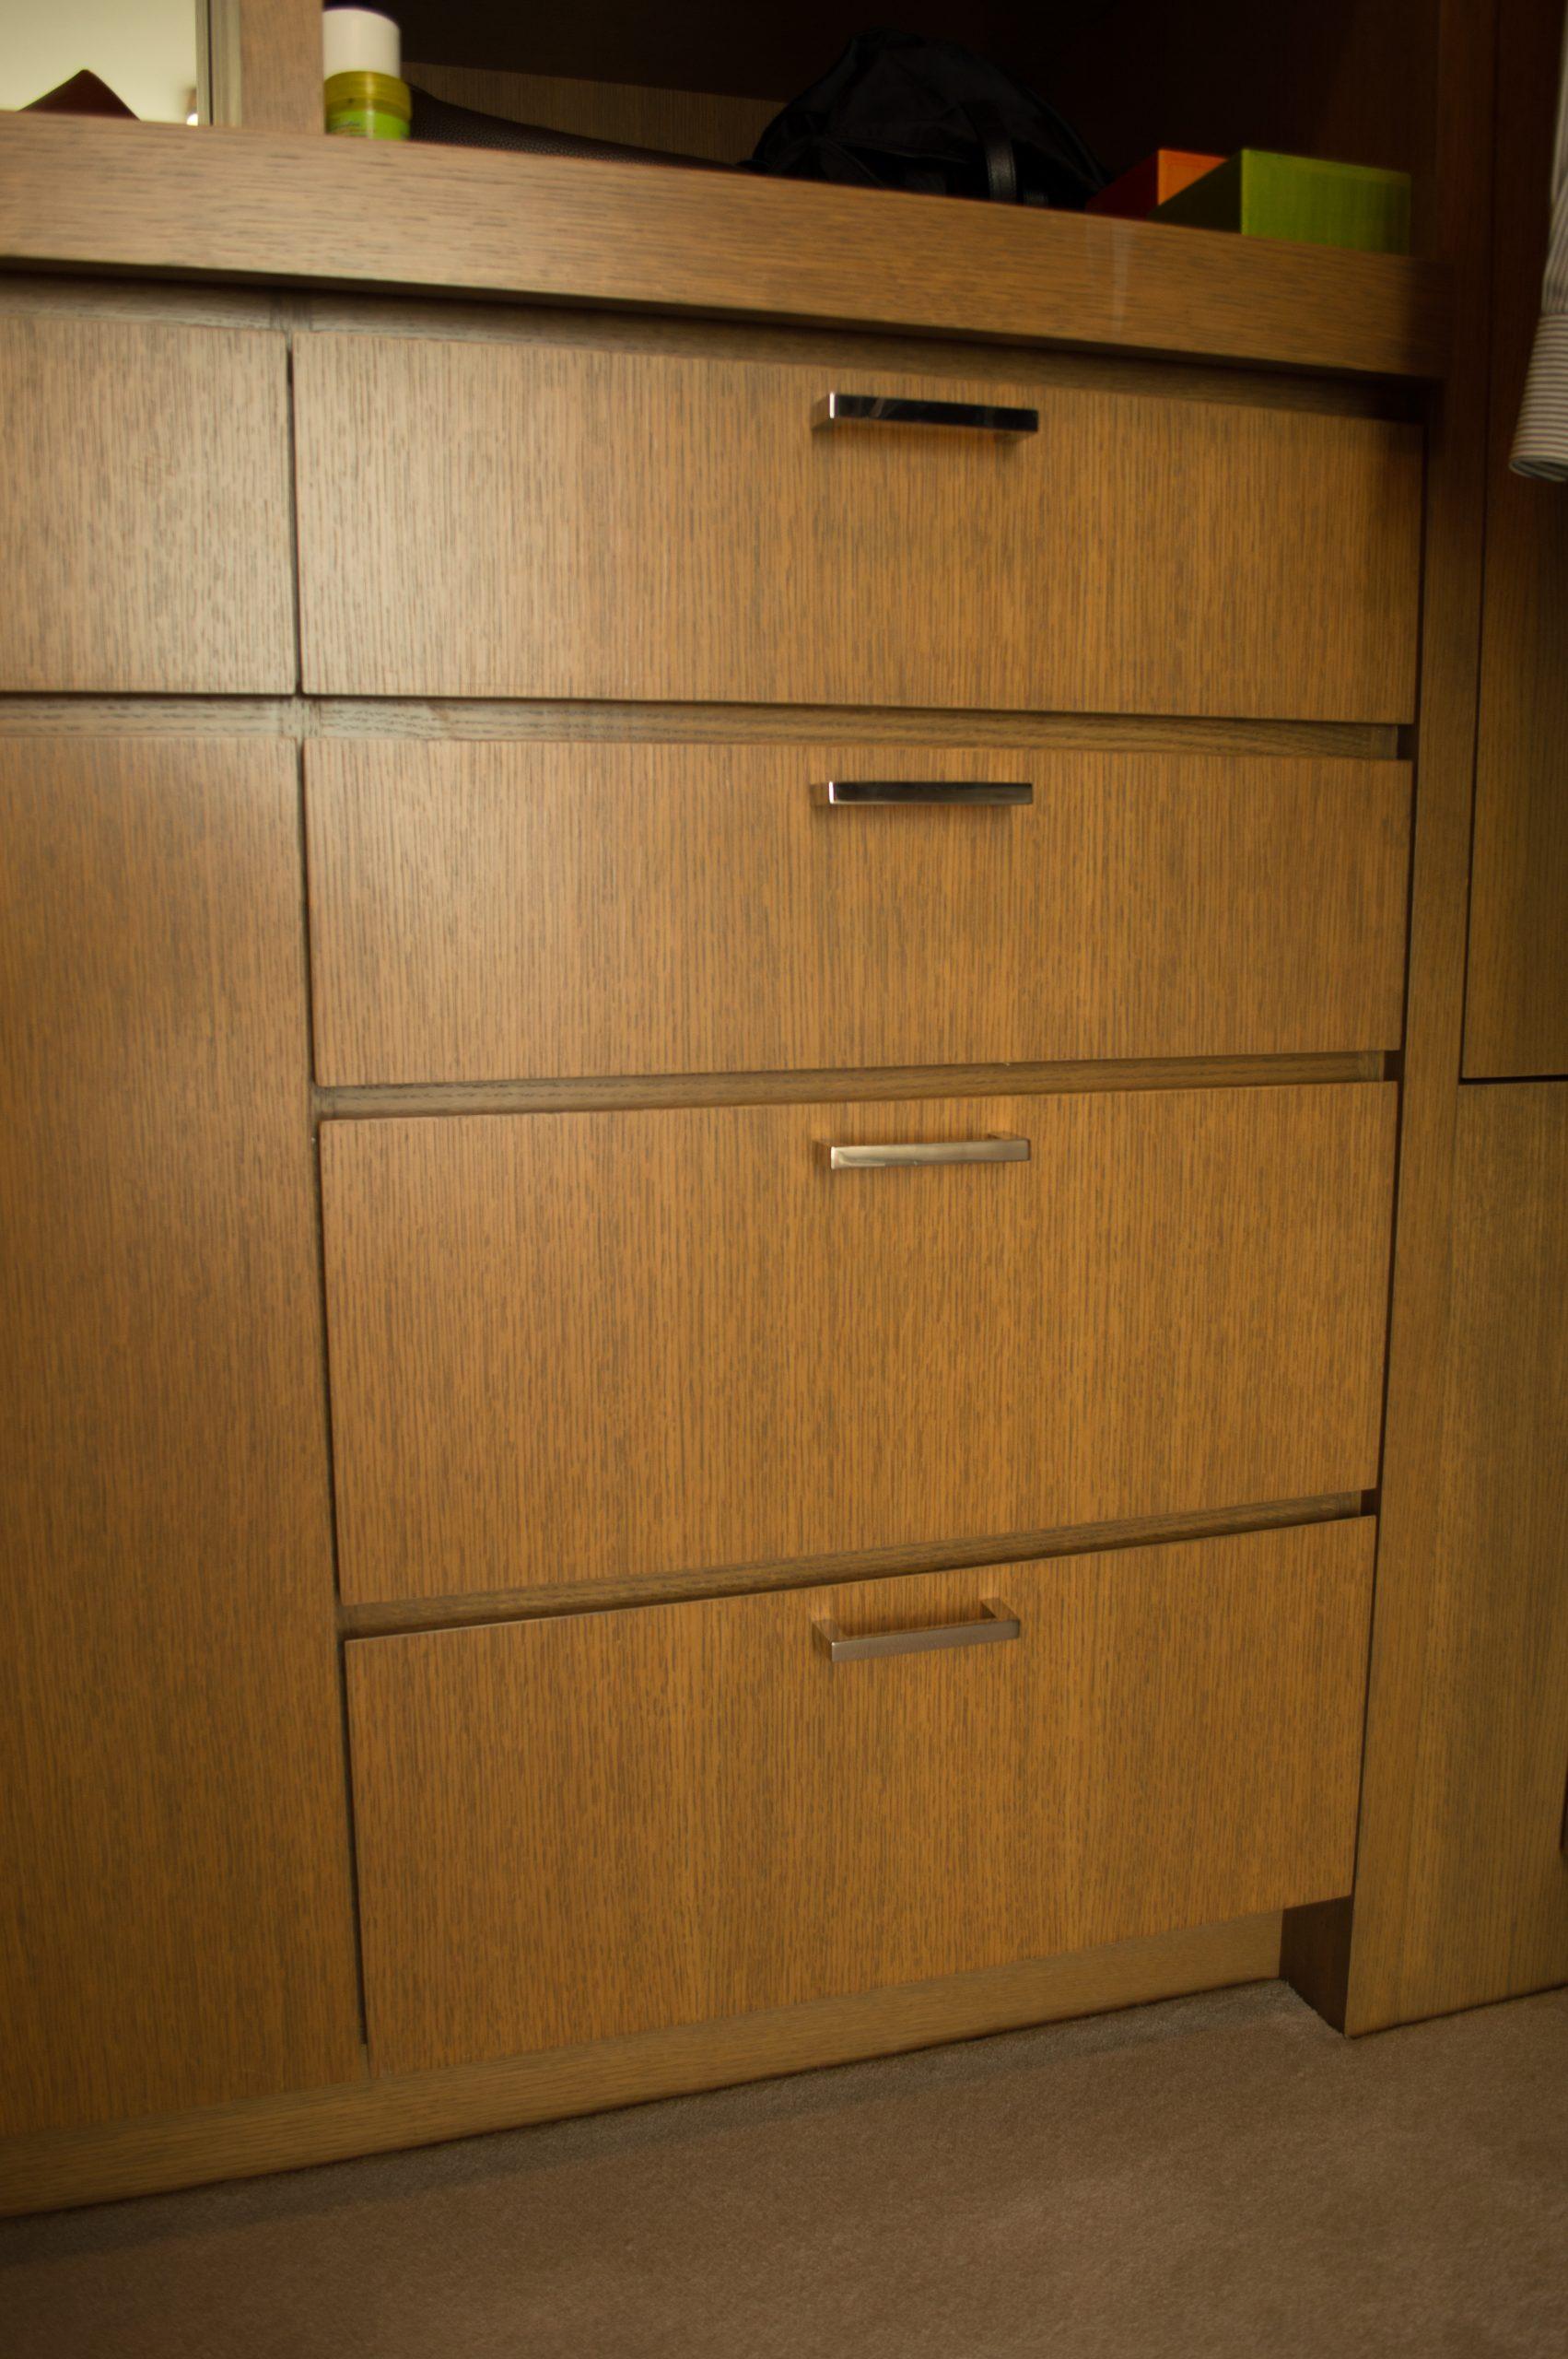 mw design workshop custom cabinetry